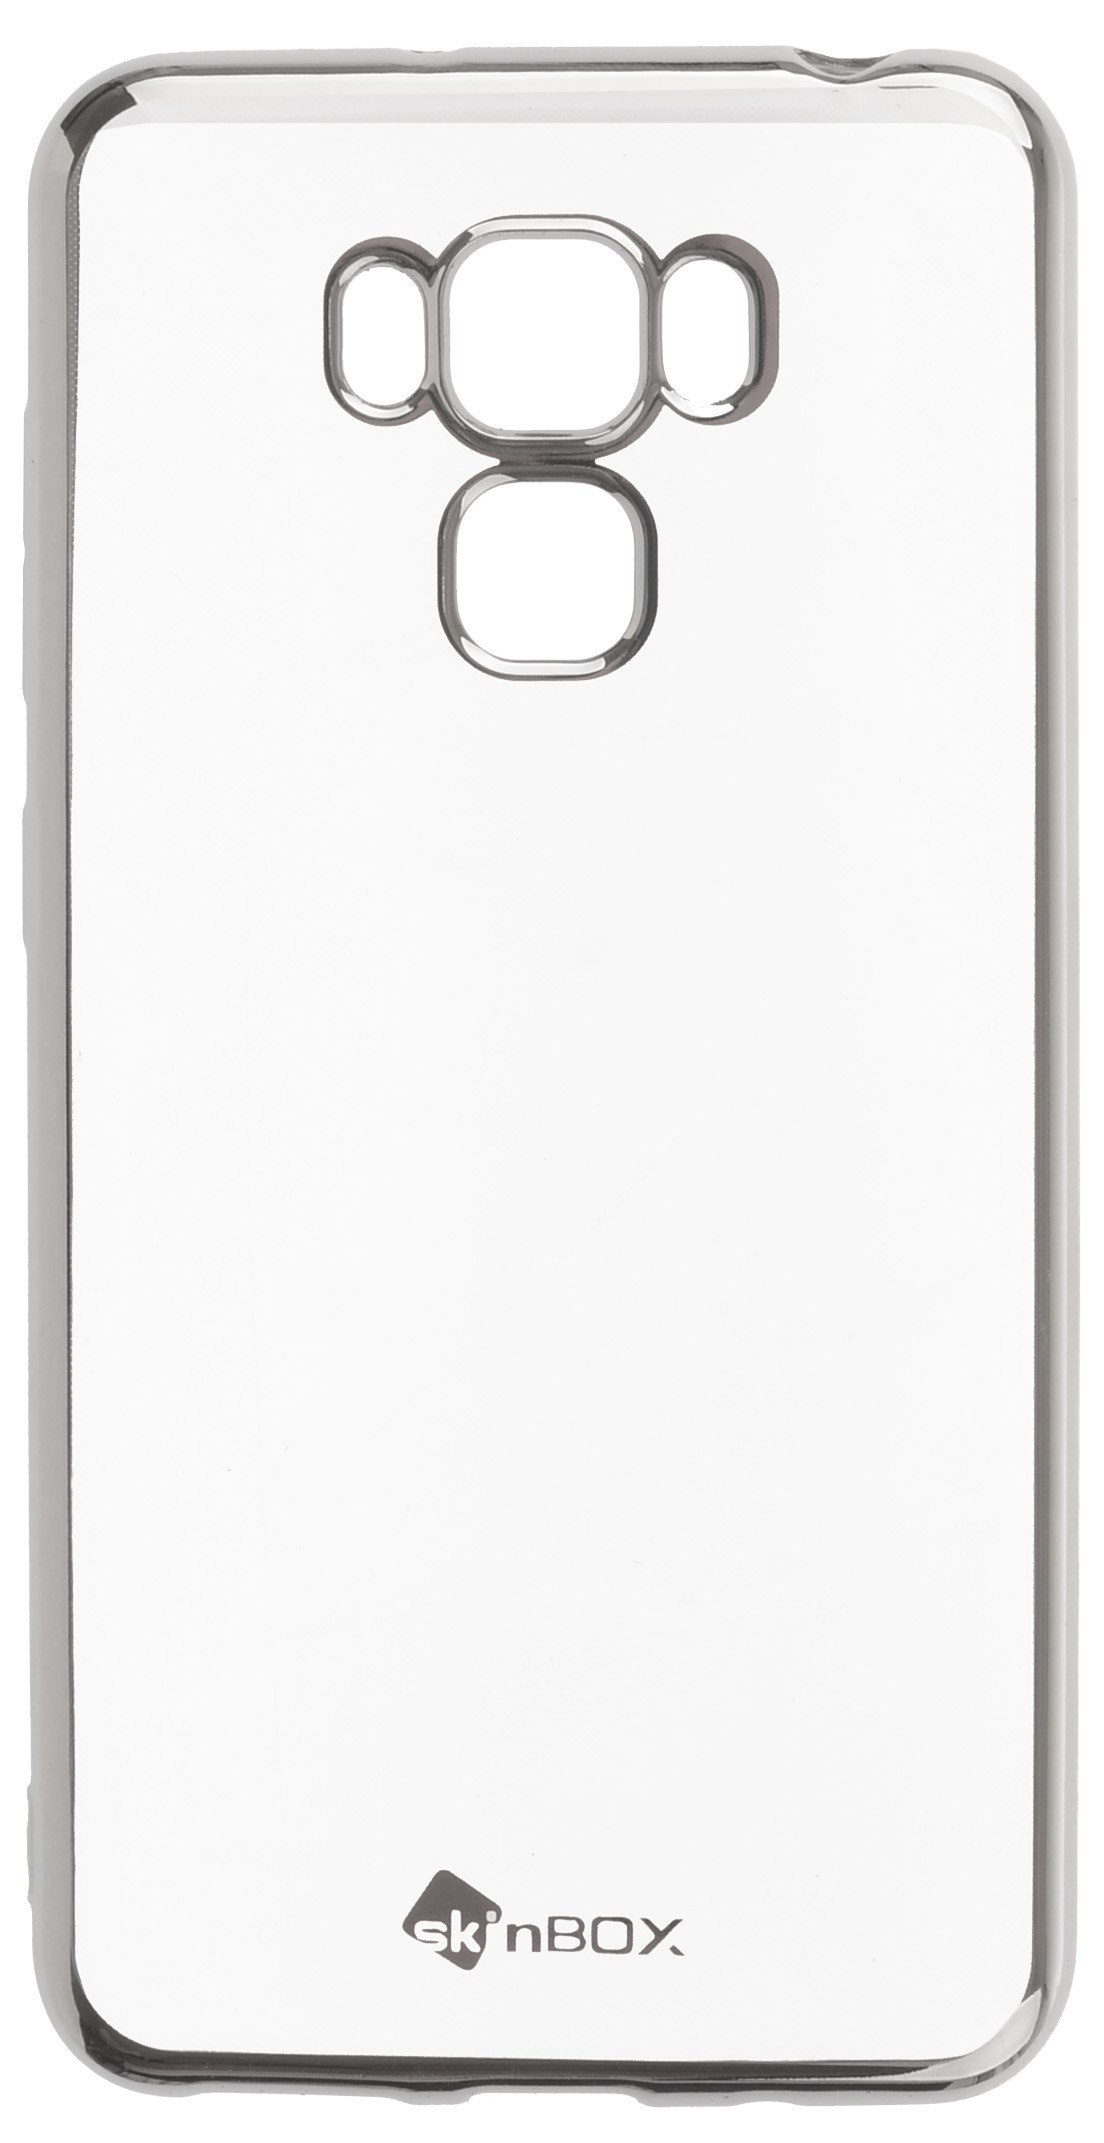 Чехол для сотового телефона skinBOX Silicone chrome border, 4660041408362, серебристый чехол для сотового телефона skinbox silicone chrome border 4630042524514 серебристый